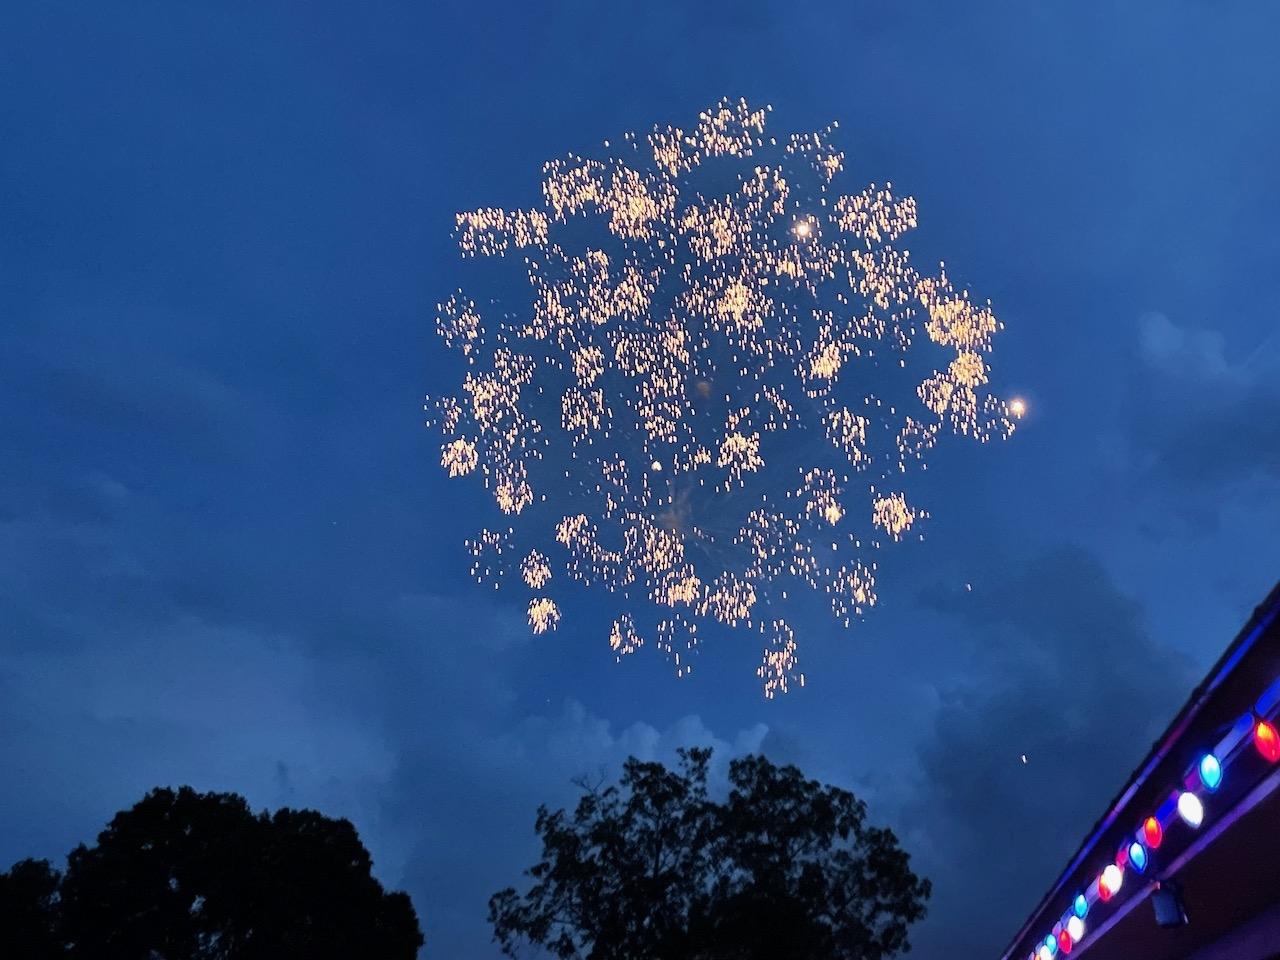 Happy Fourth of July 2021!